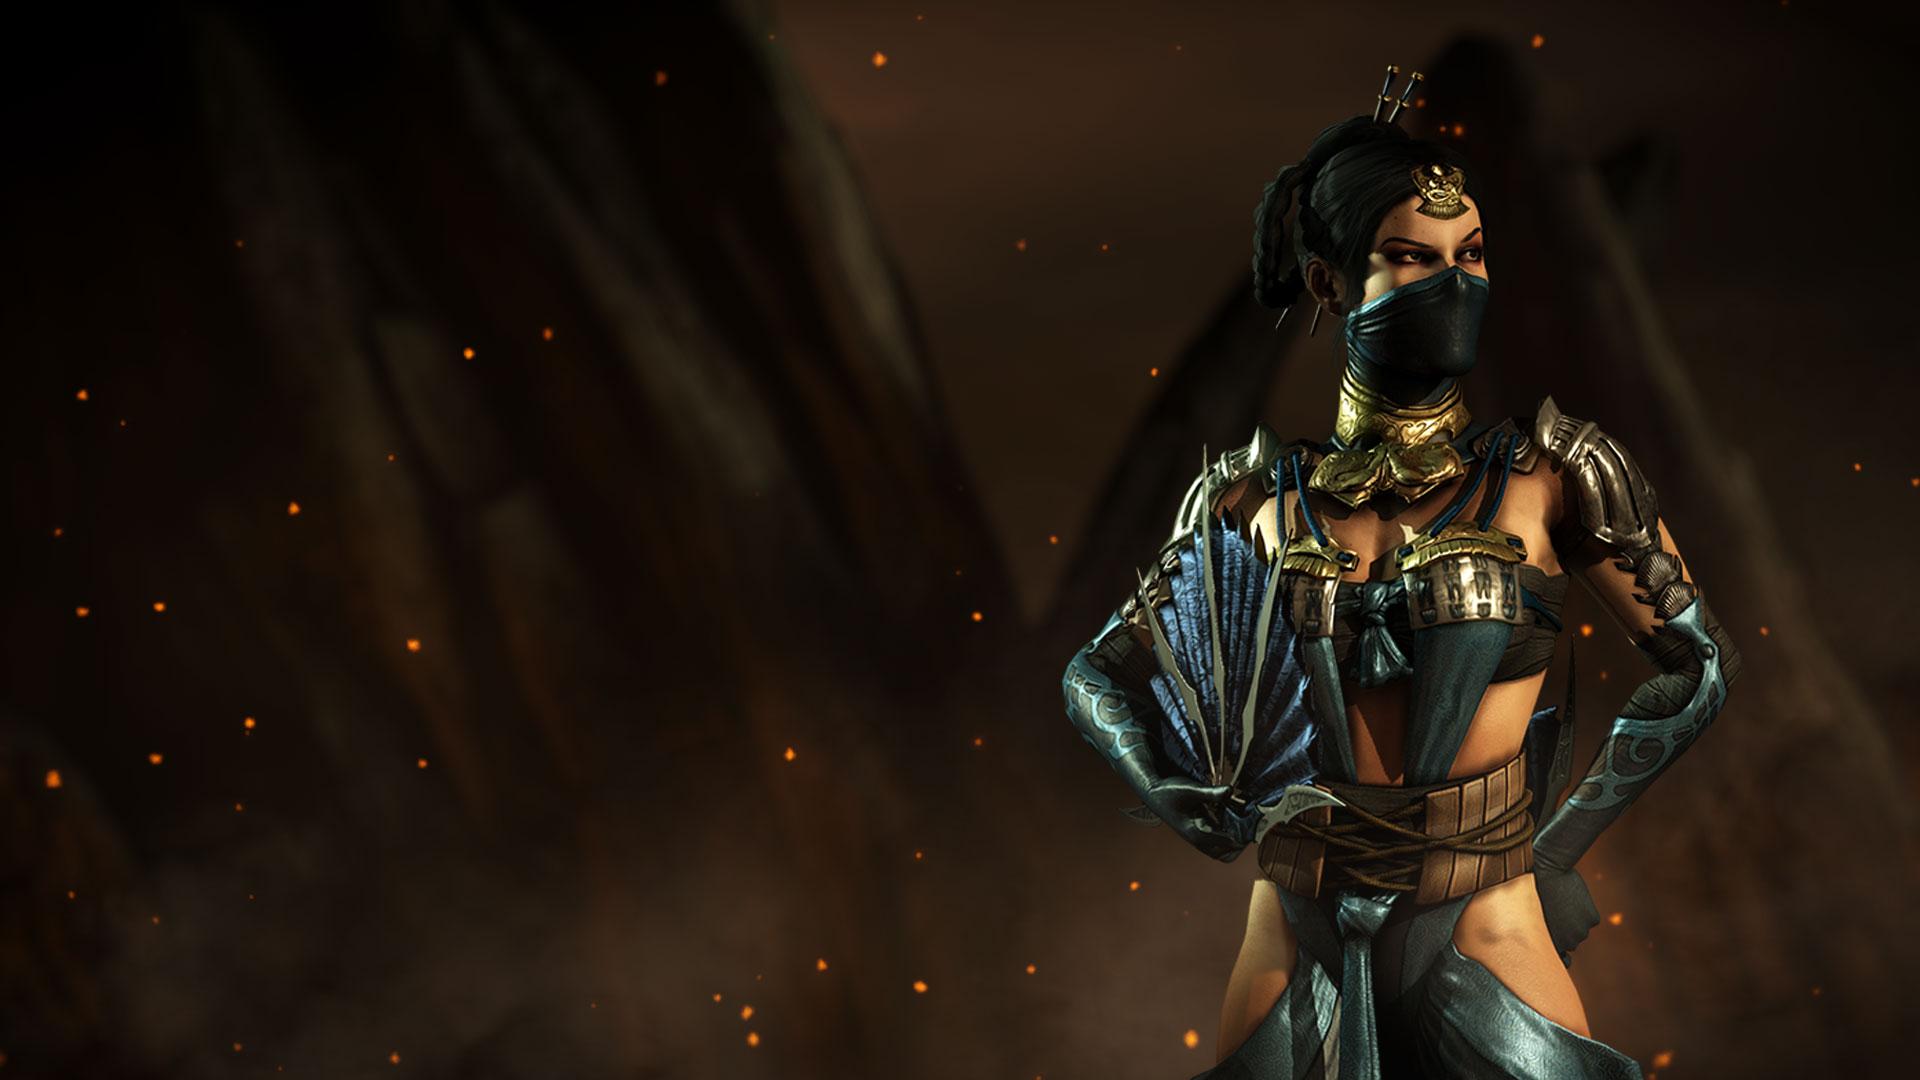 Smoking Girl Hd Wallpaper For Mobile Mkwarehouse Mortal Kombat X Kitana